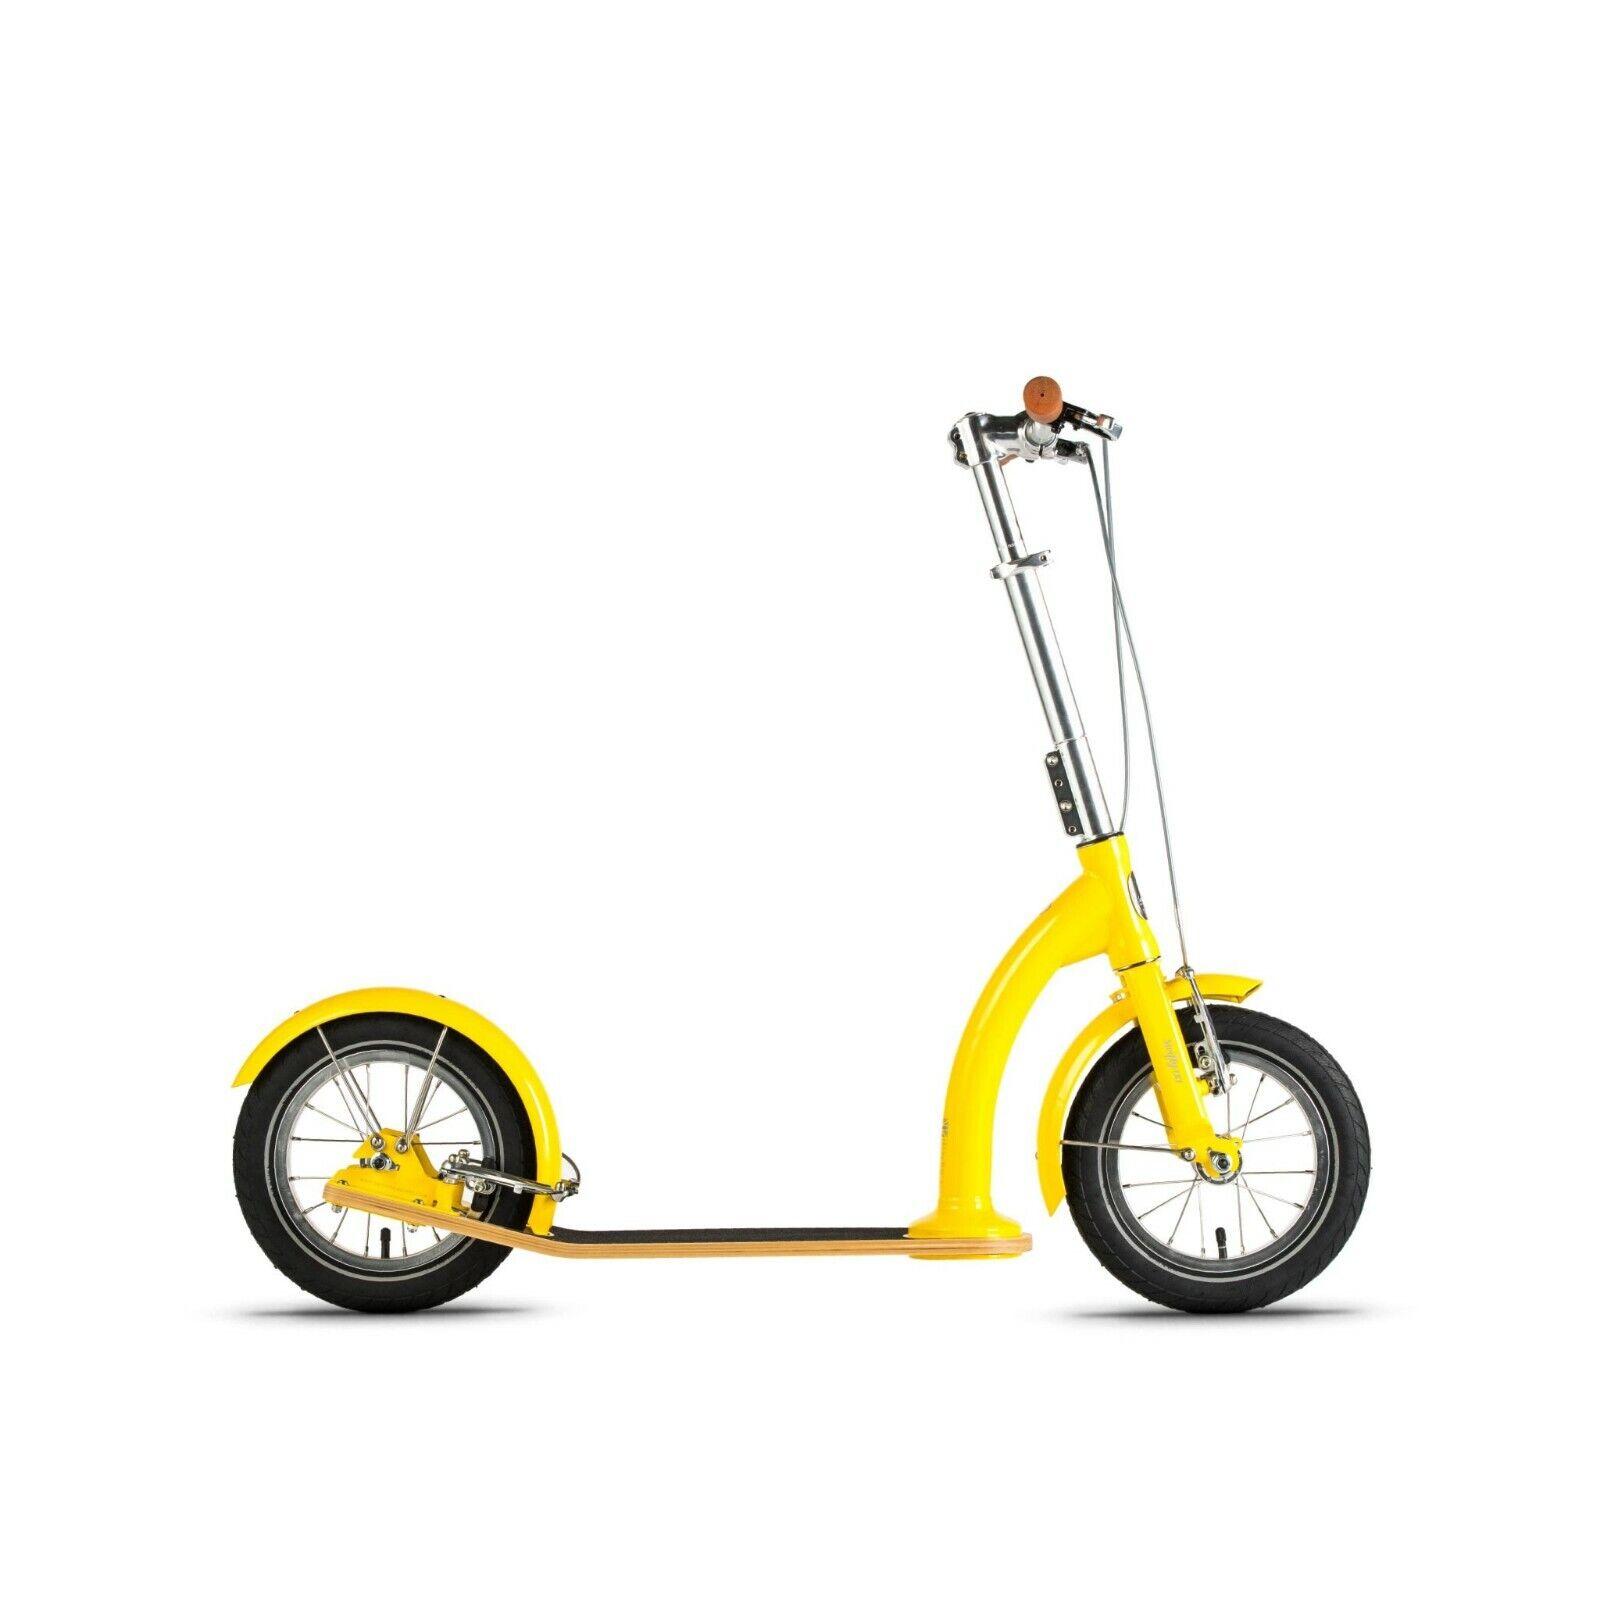 Premium Triciclo Bambini Scooter 712 YO   swiftyixi   Swifty SCOOTER   Giallo